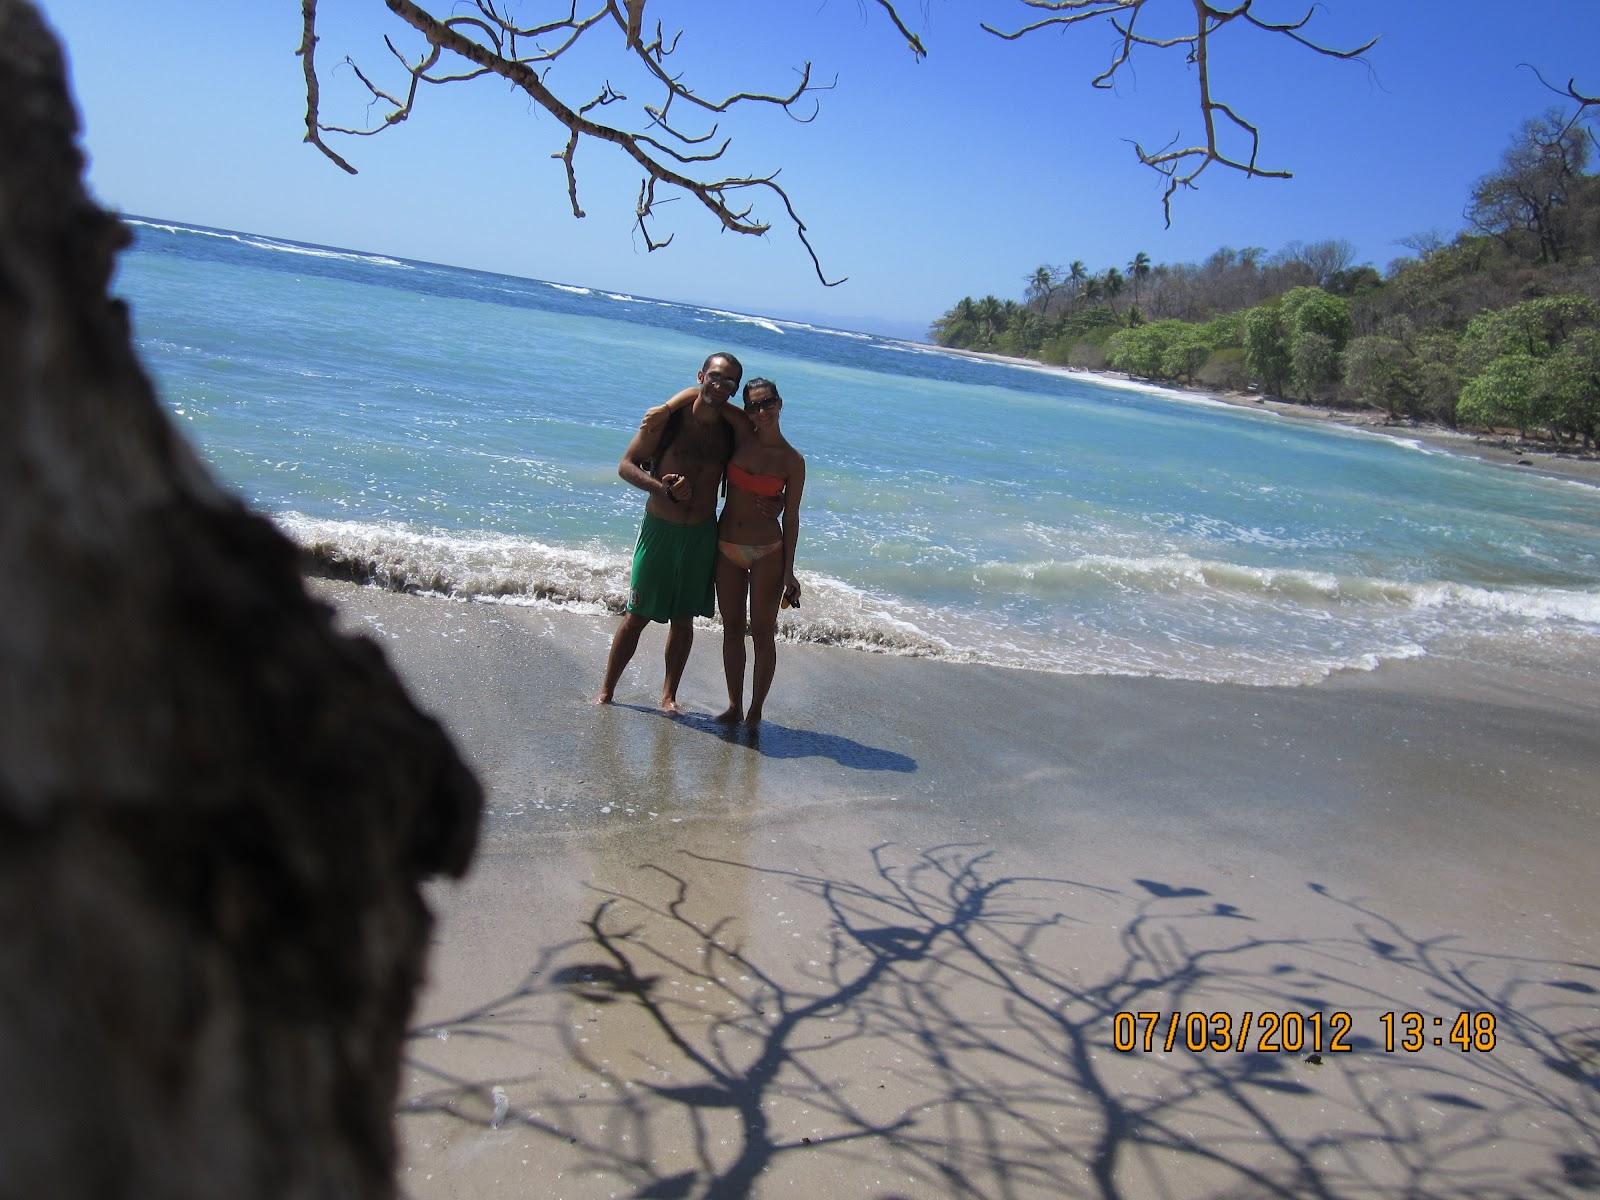 Cabina de playa 05 - 2 4